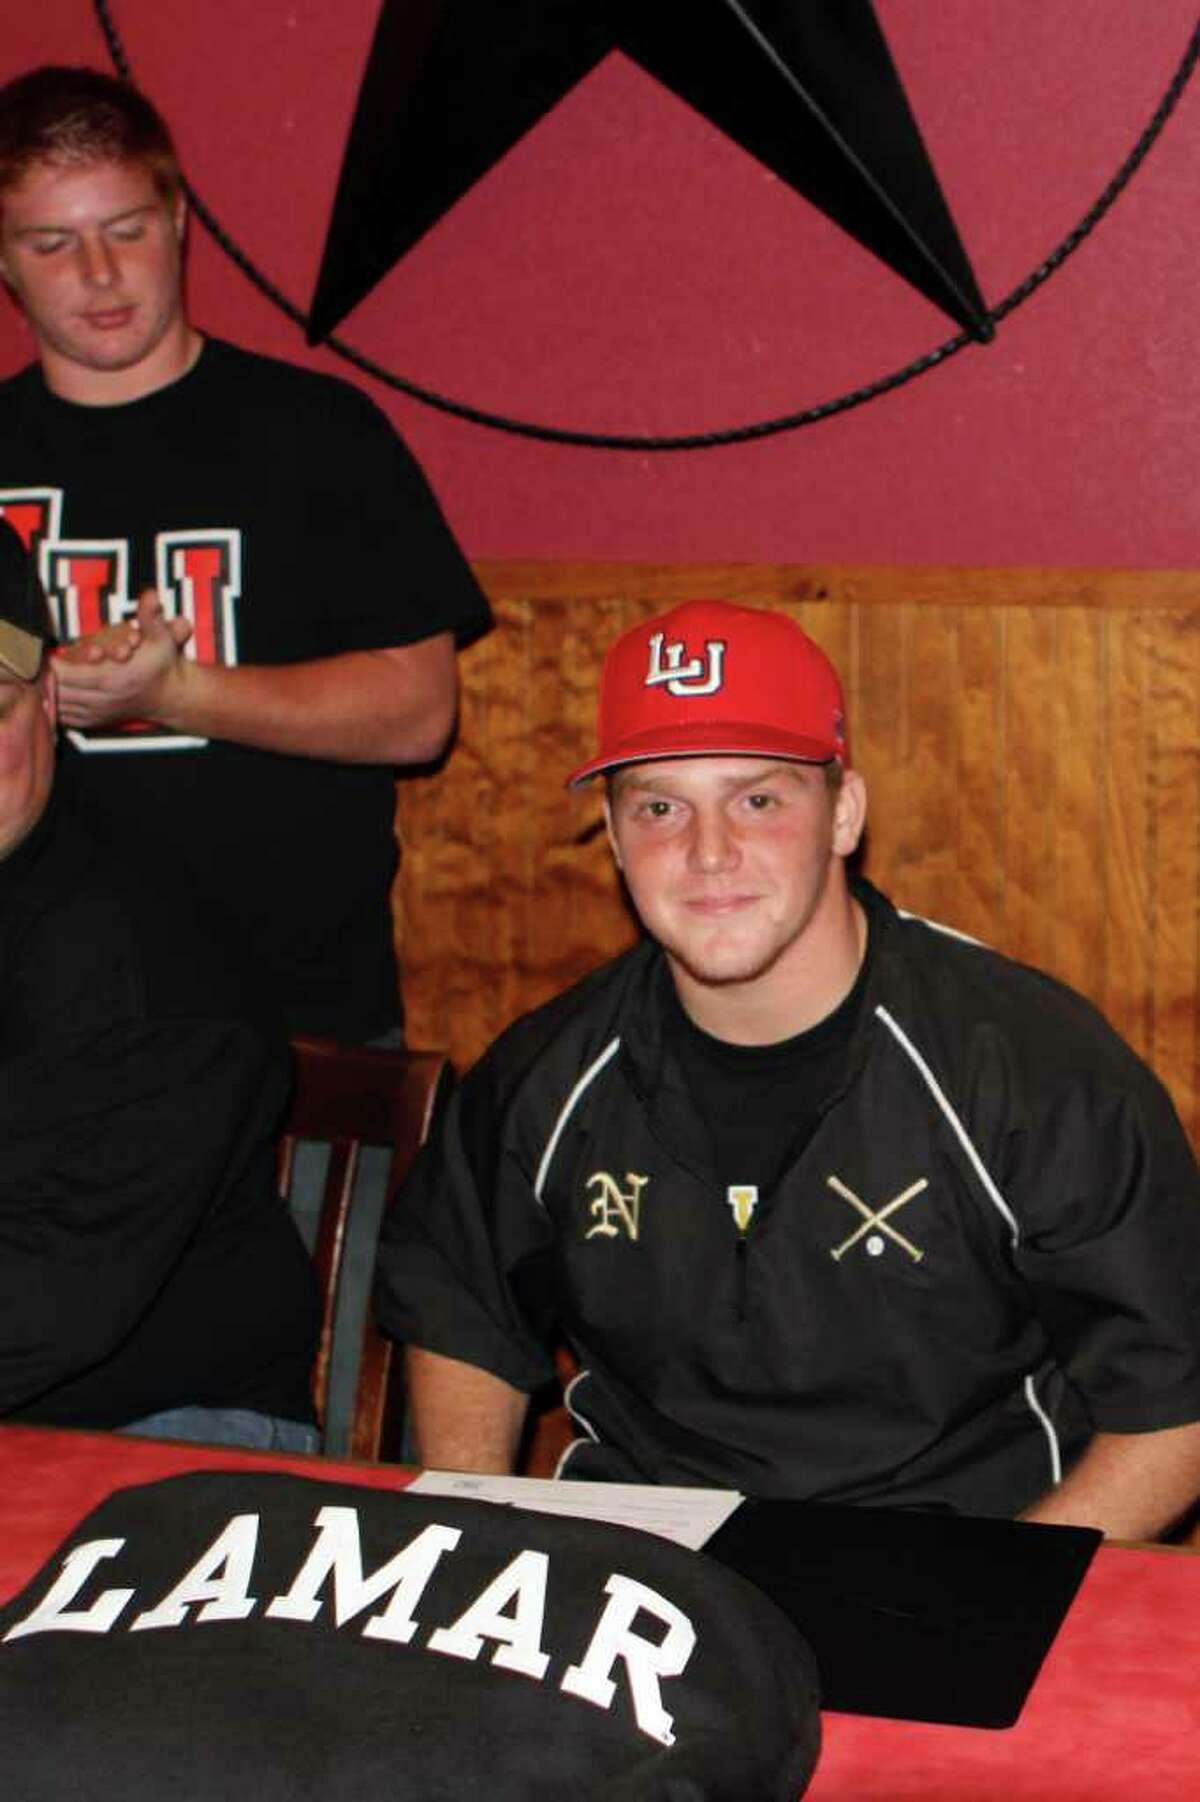 Nederland baseball player Brett Brown is signed to play for Lamar University.